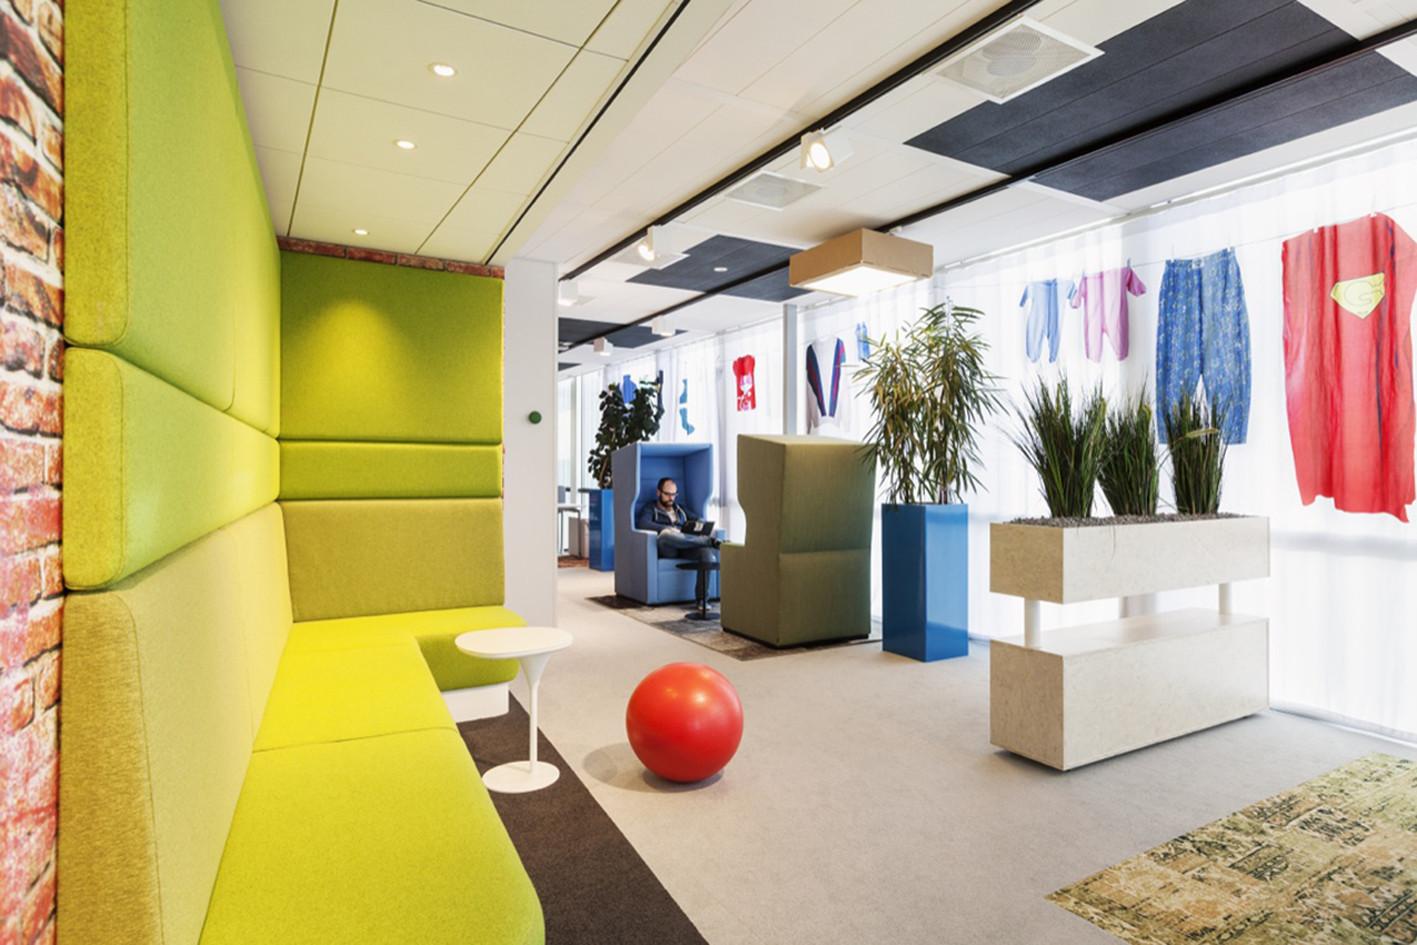 google office decor. Zoom Image | View Original Size Google Office Decor